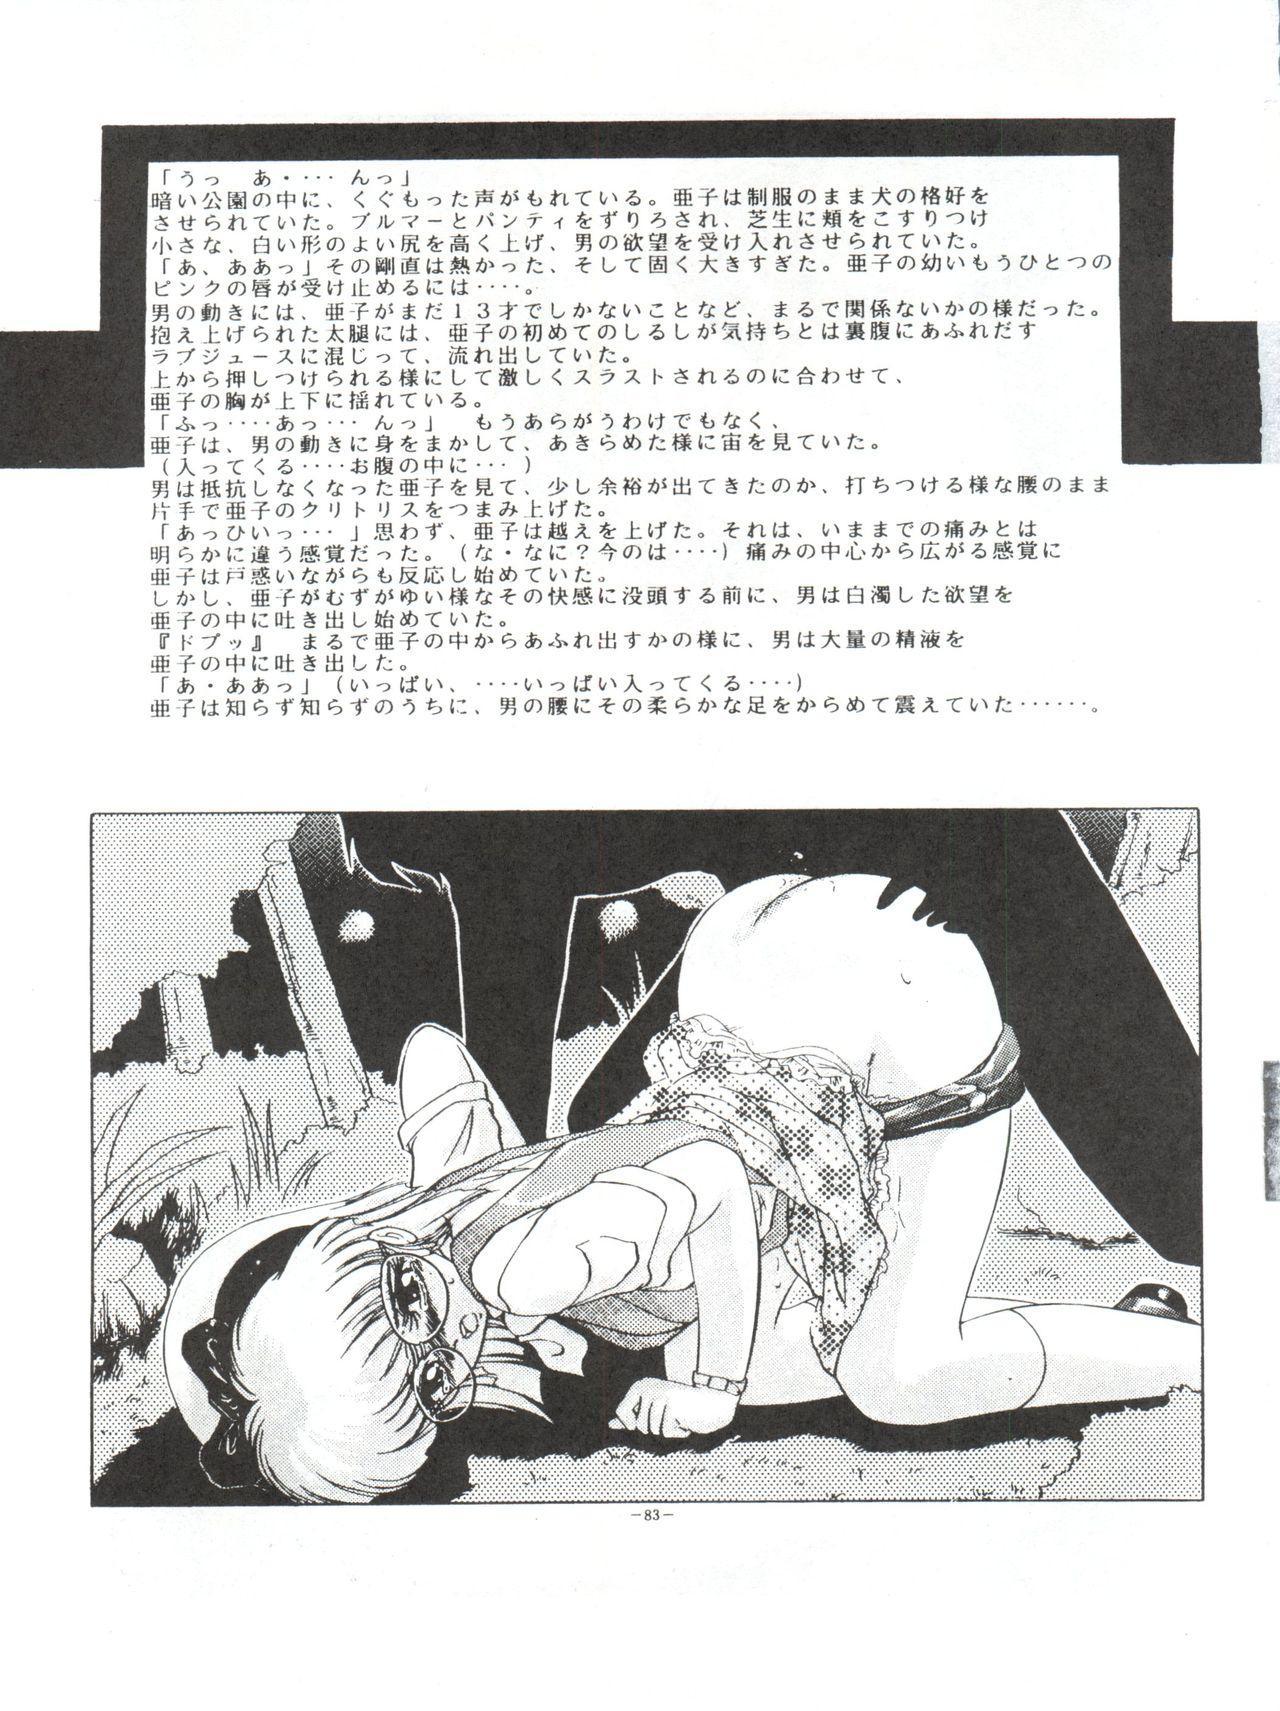 BLOOMAGAZINE Vol. 4 82